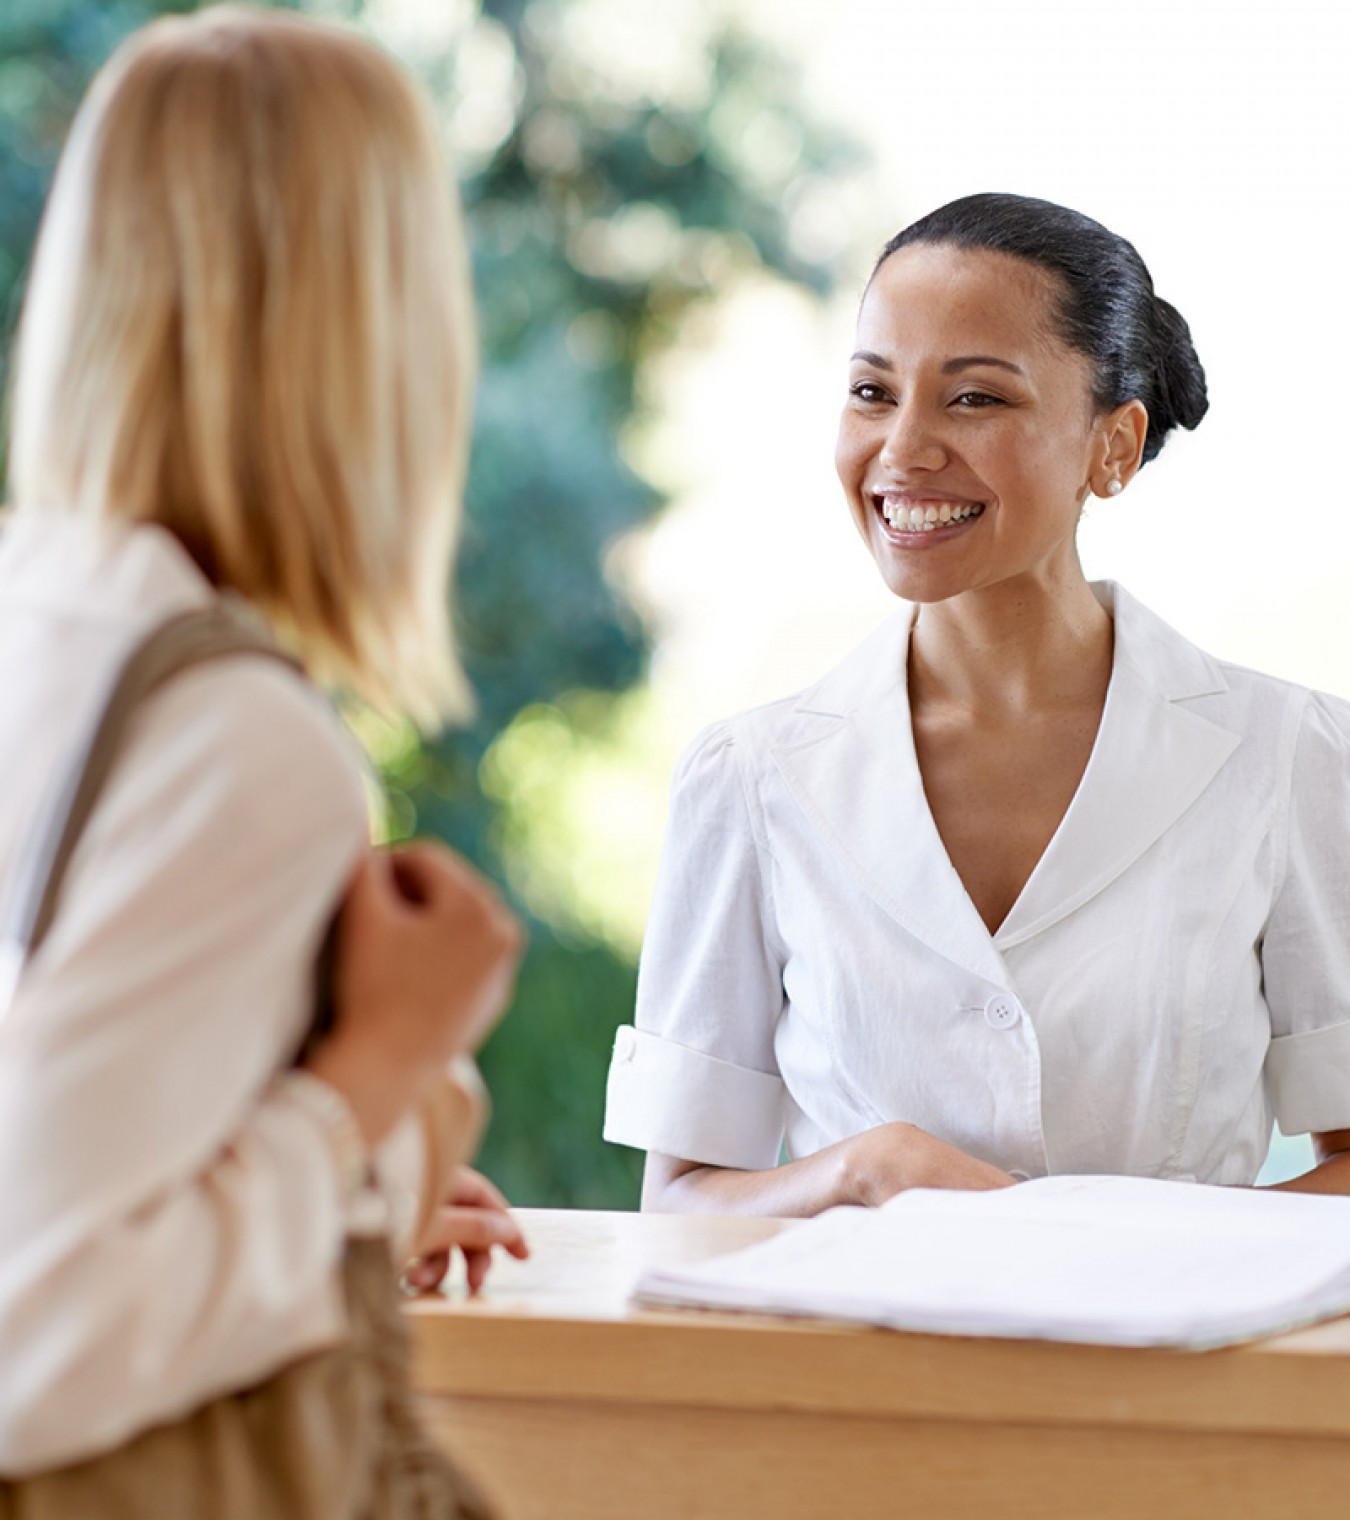 Customer Service Intermediate Level 2 - testimonial